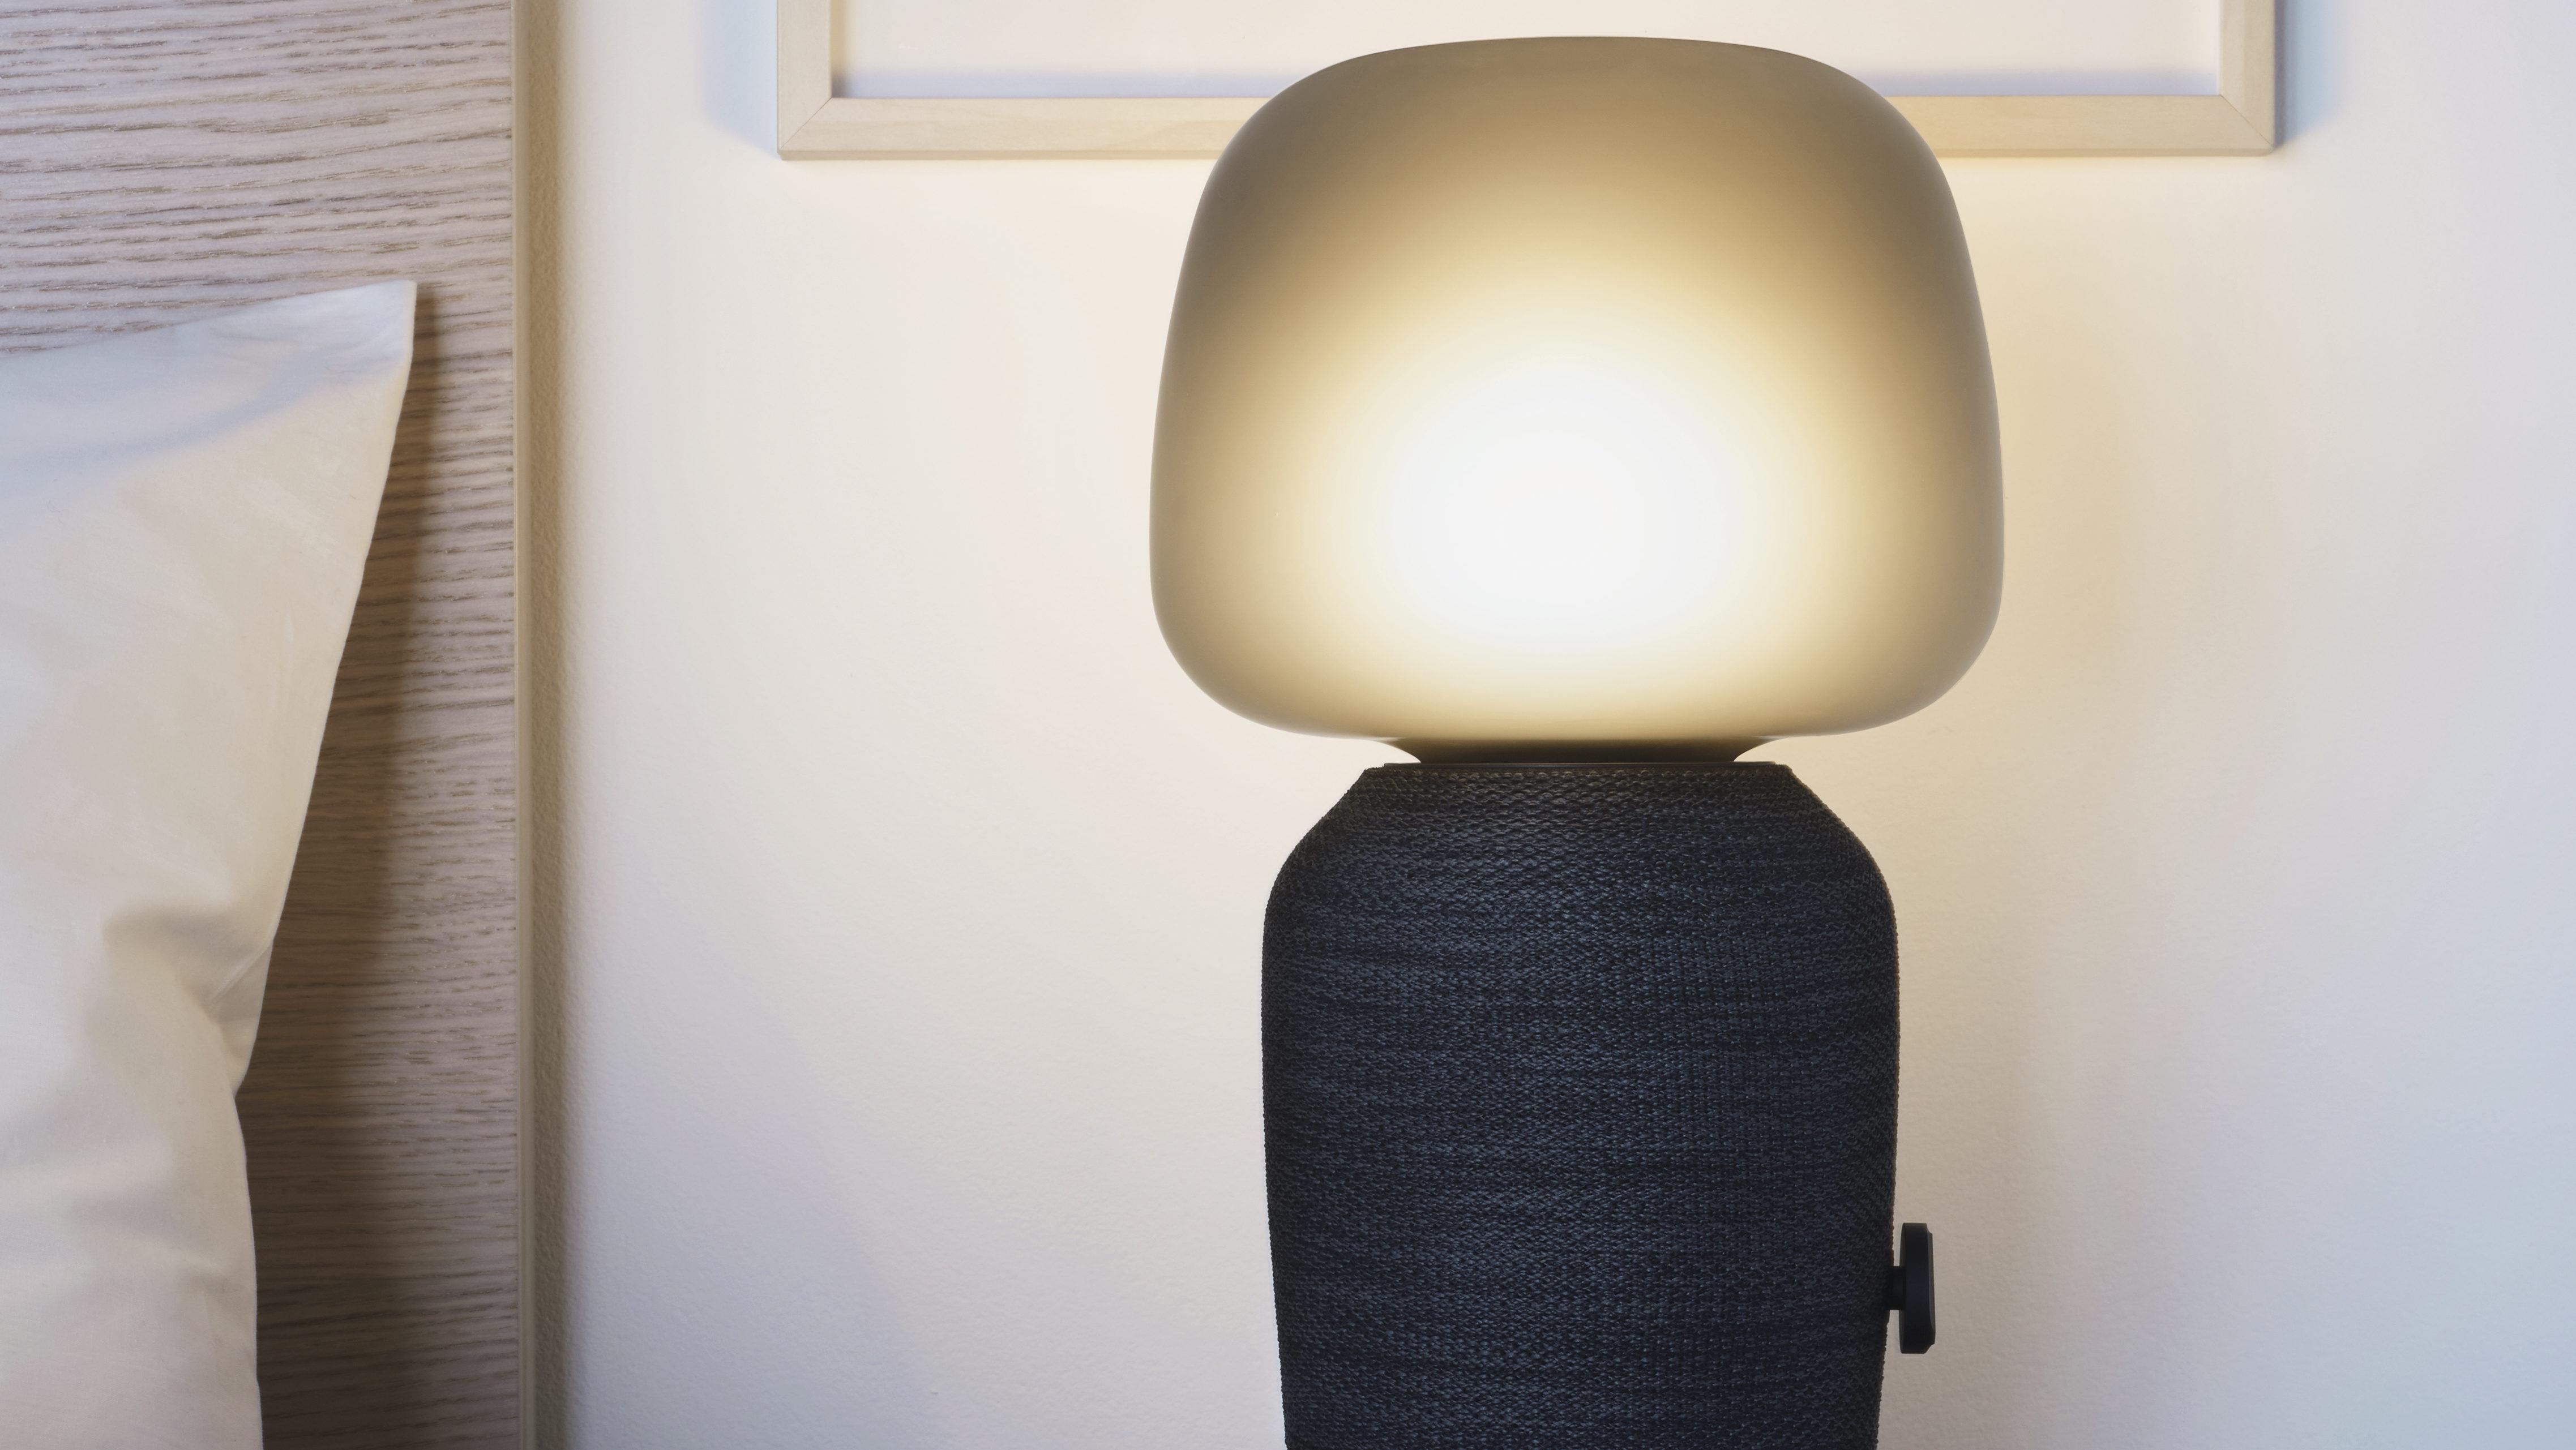 Lampe fra IKEA | FINN.no